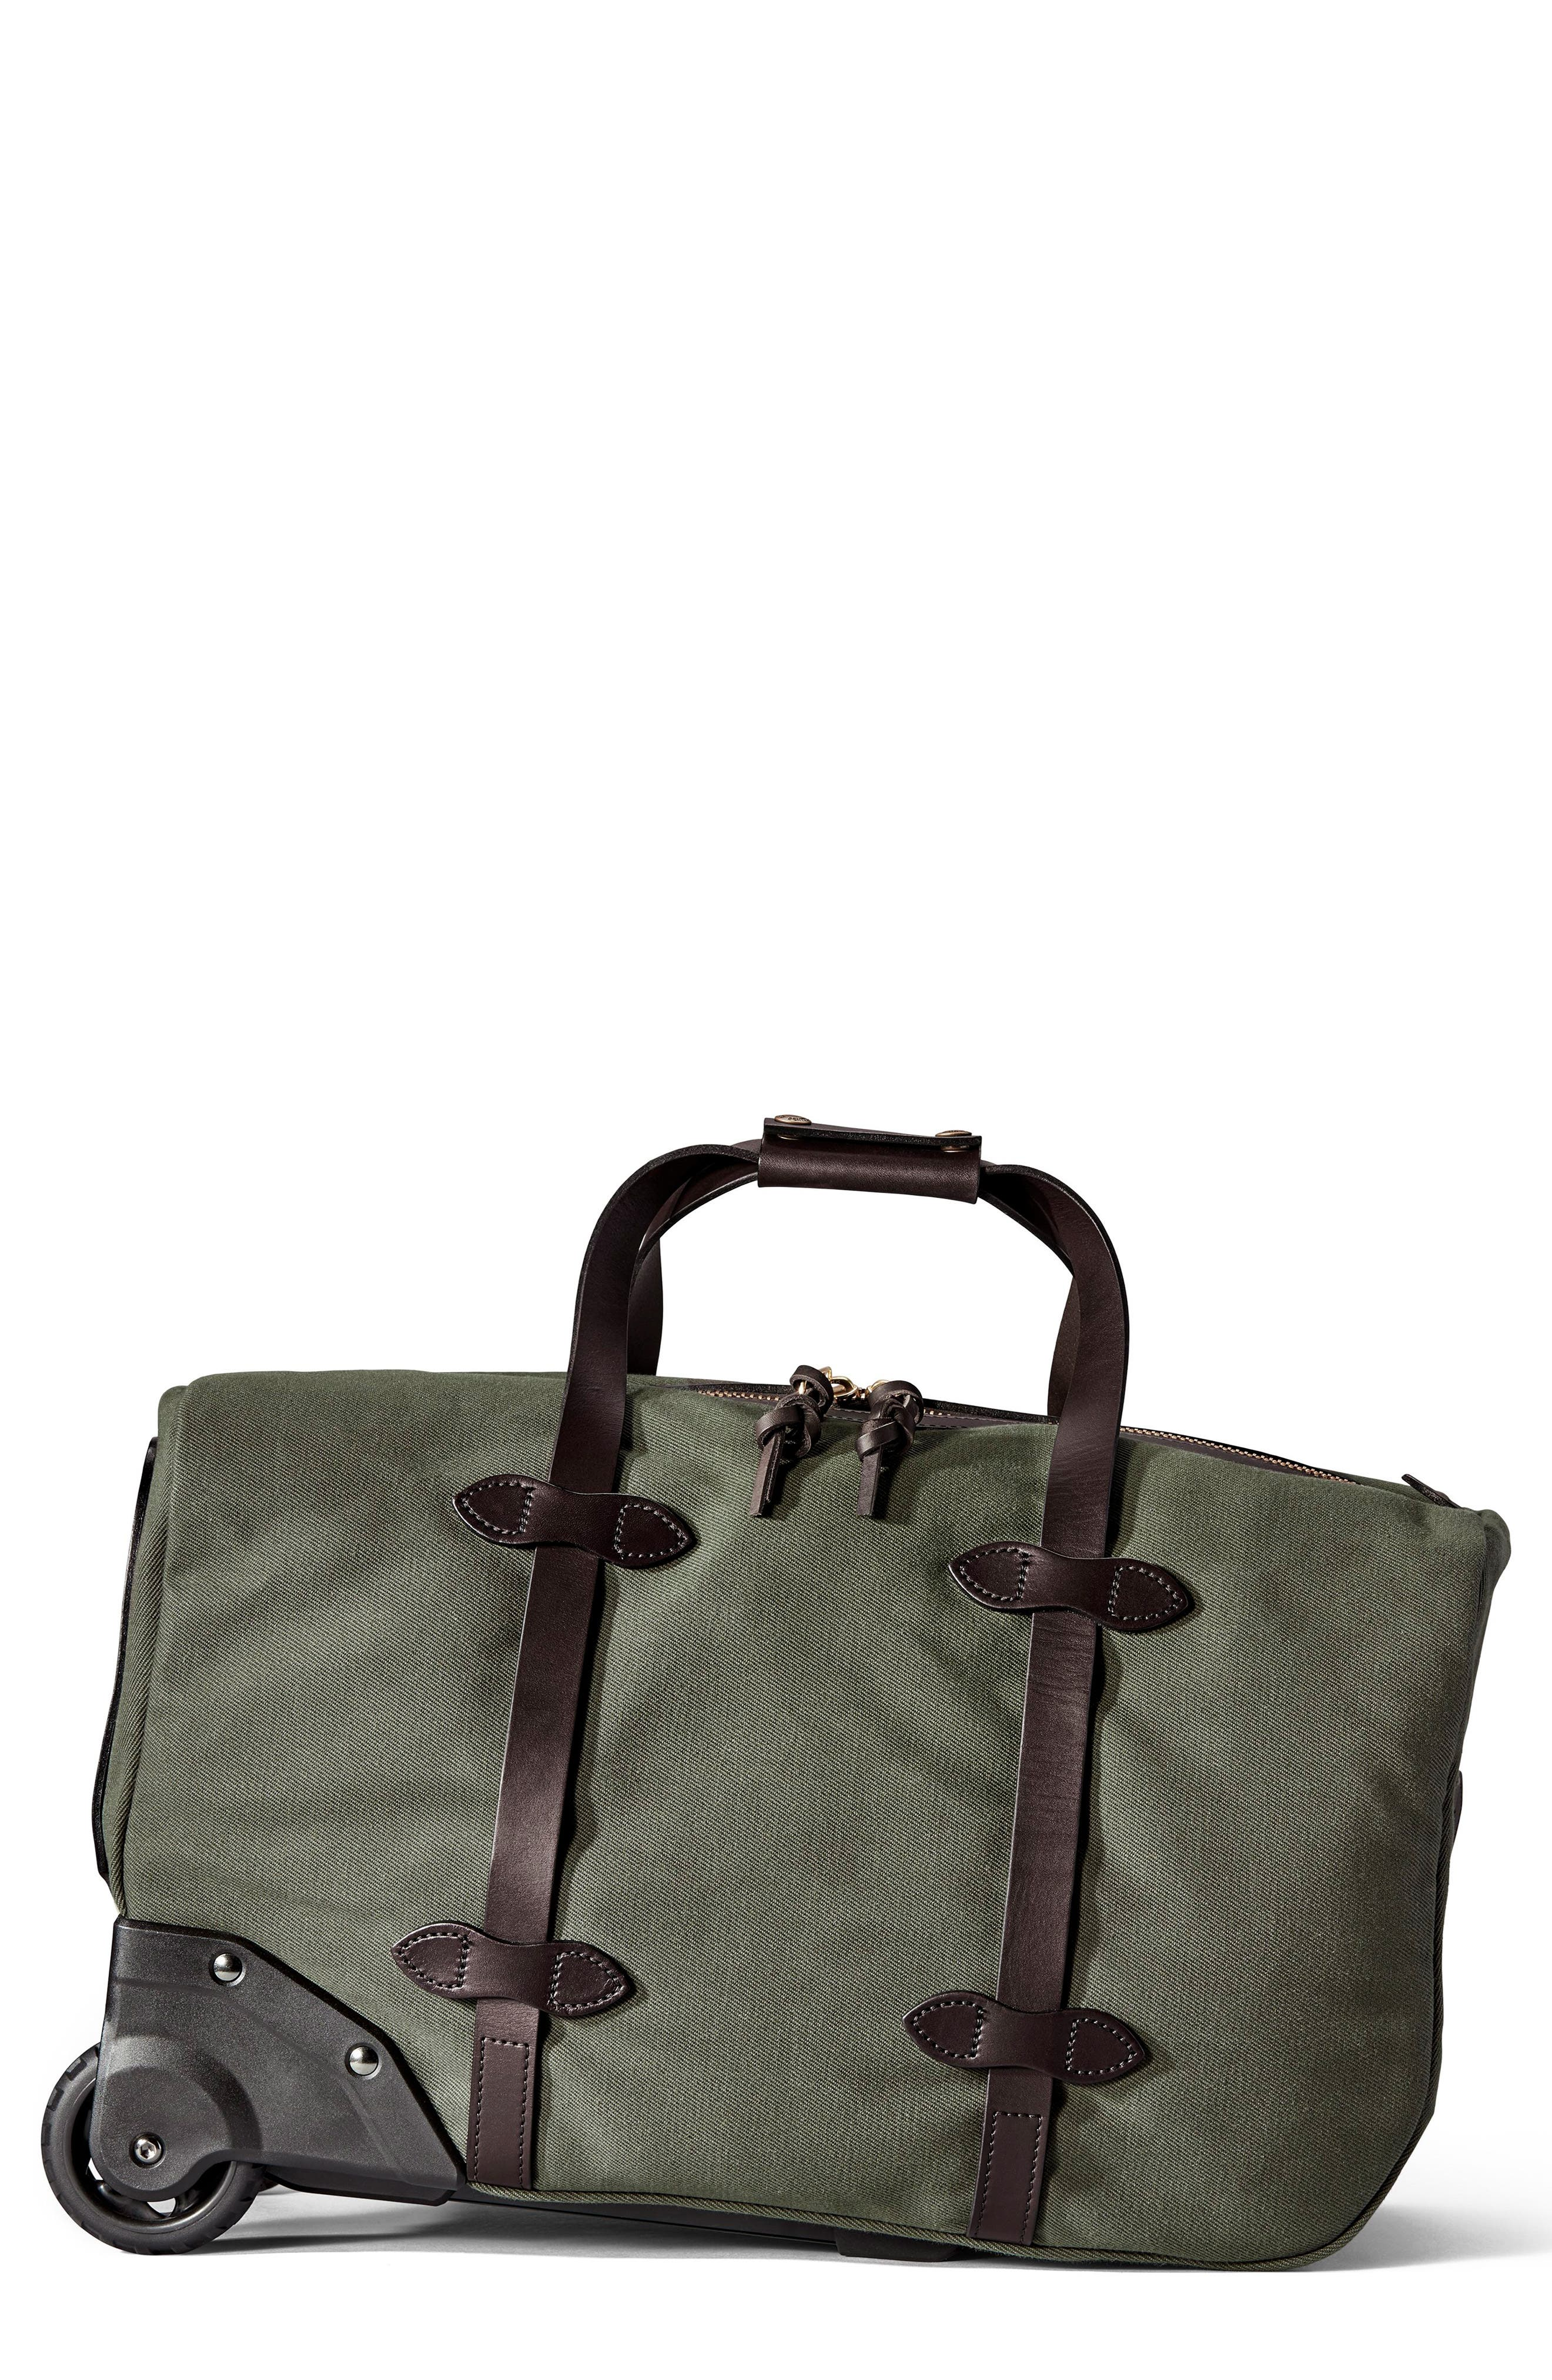 Filson Small Rolling Duffel Bag